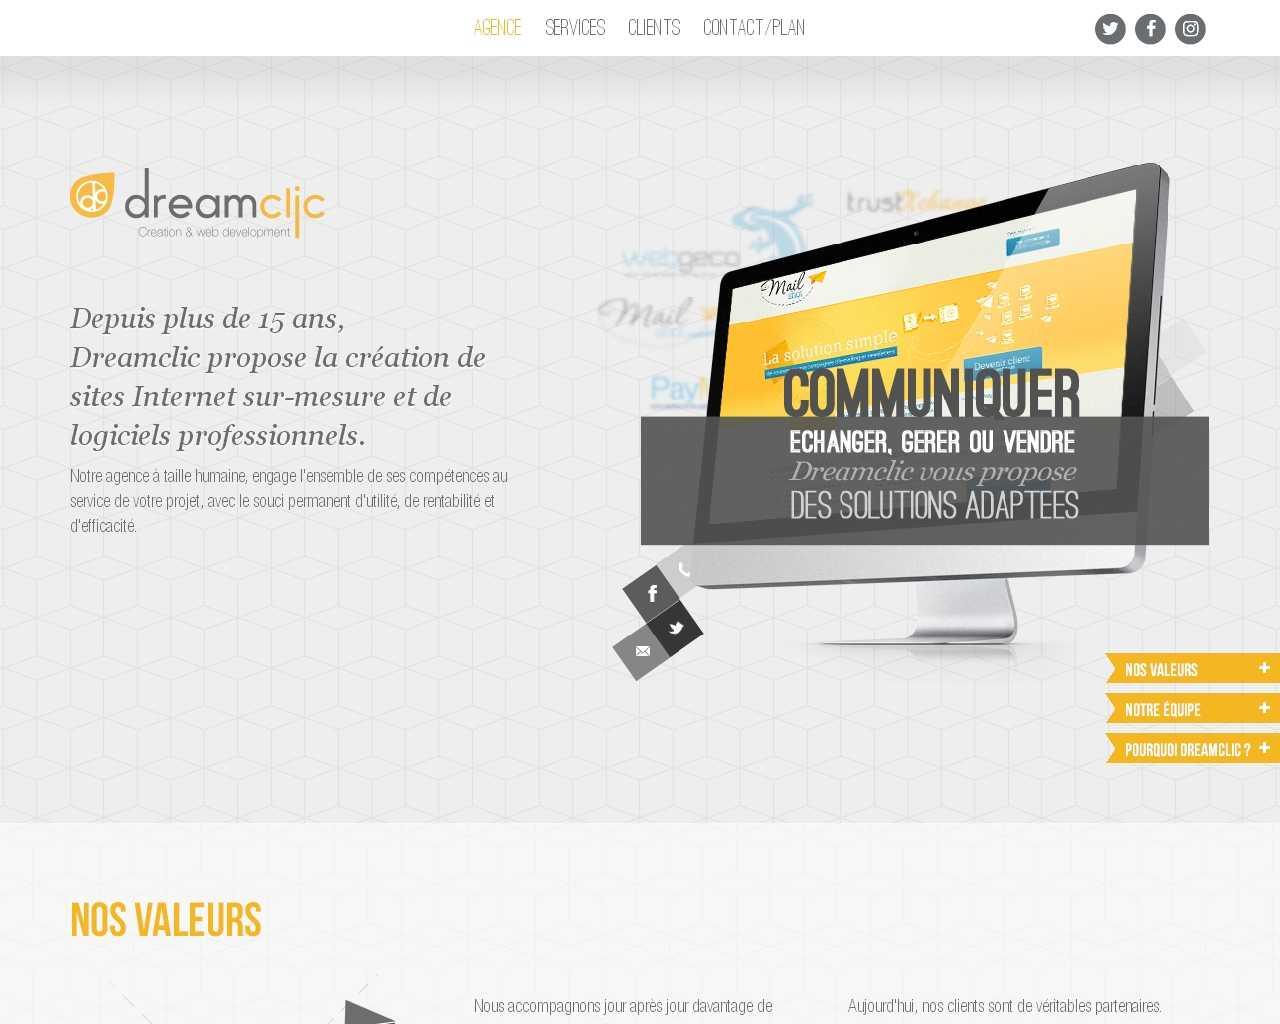 Dreamclic